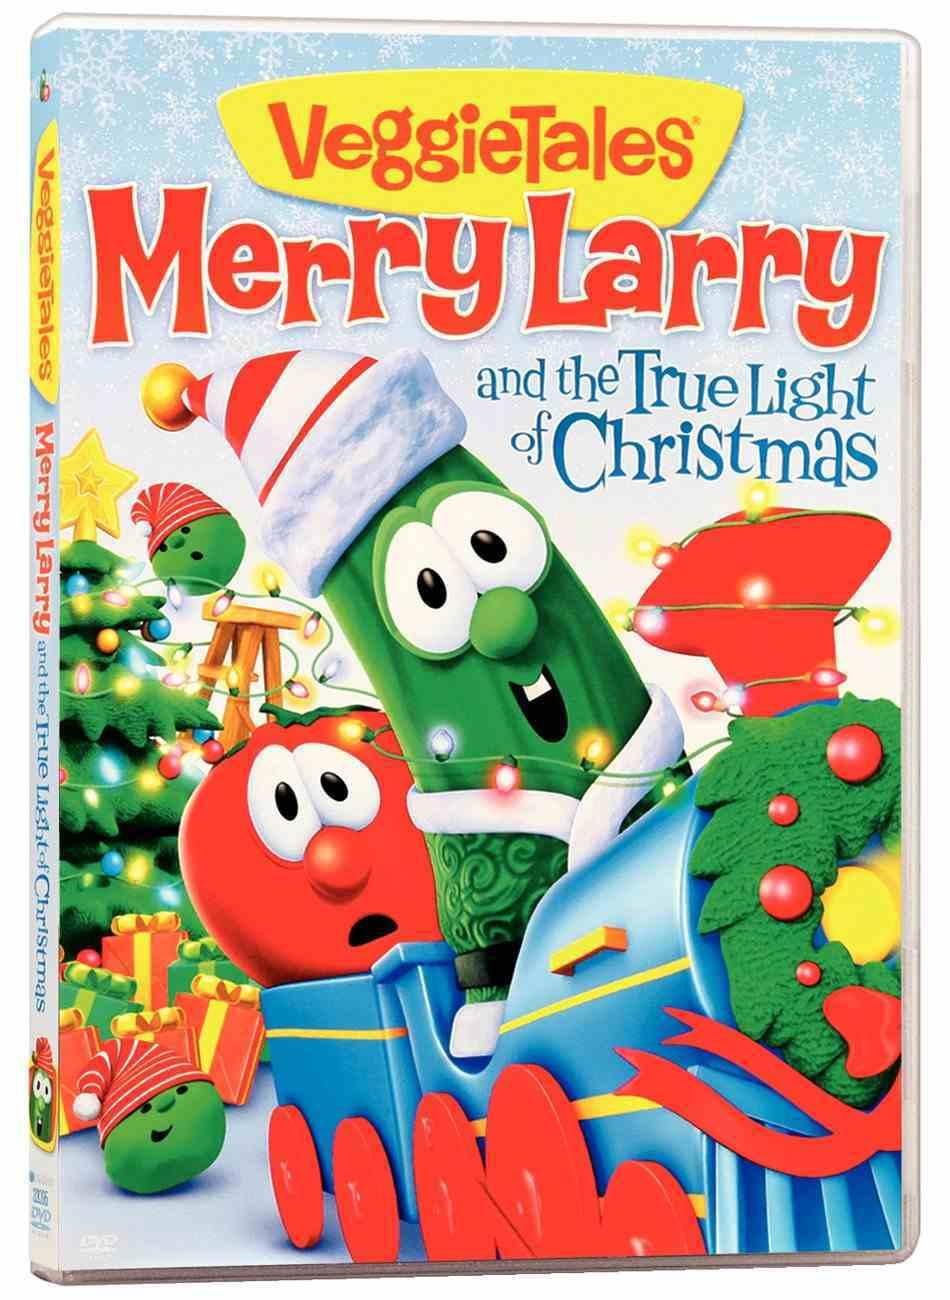 Veggie Tales #54: Merry Larry & True Light of Christmas (#54 in Veggie Tales Visual Series (Veggietales)) DVD